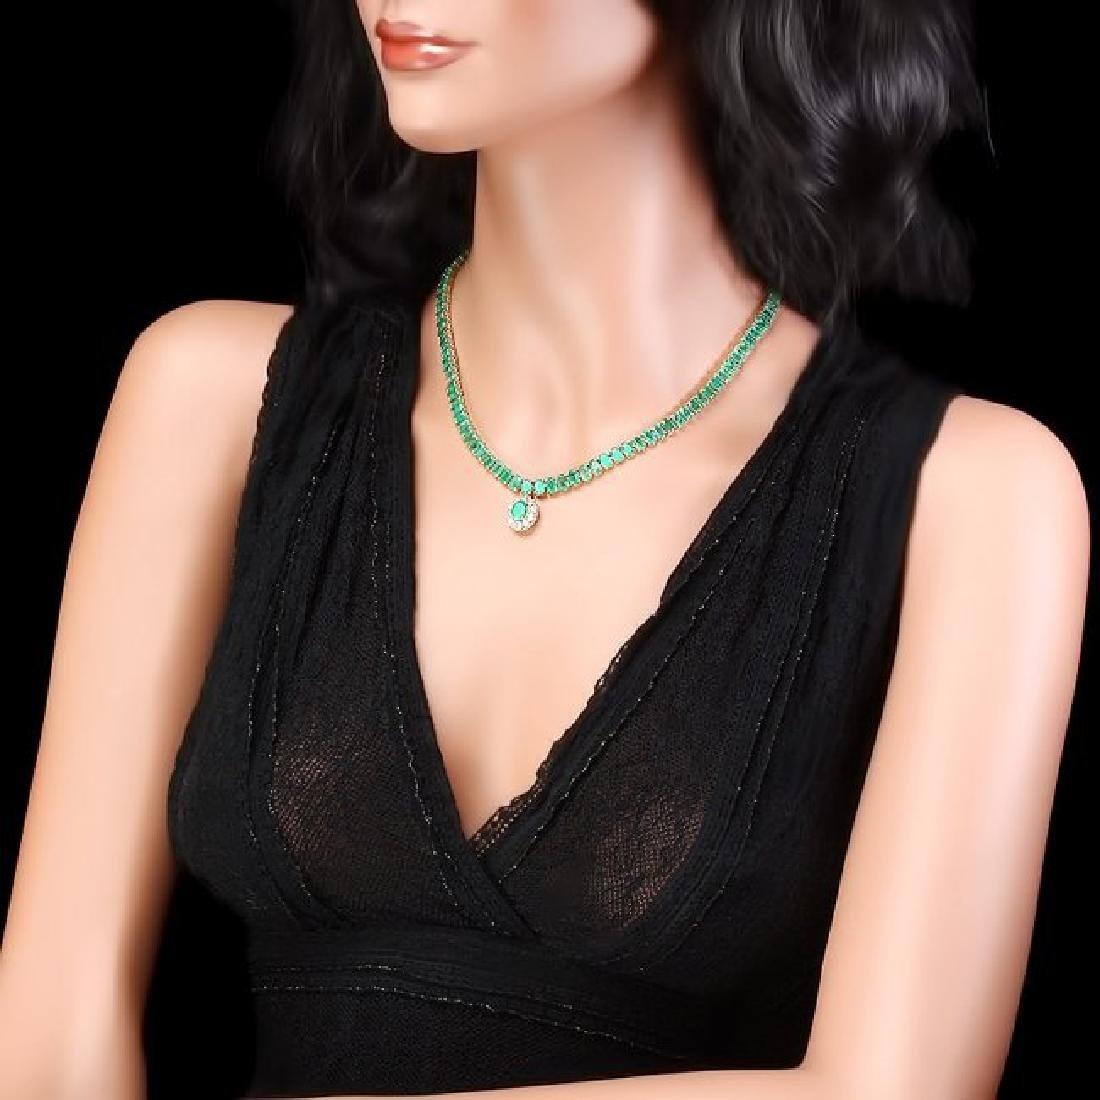 14k Gold 41.75ct Emerald 0.95ct Diamond Necklace - 5